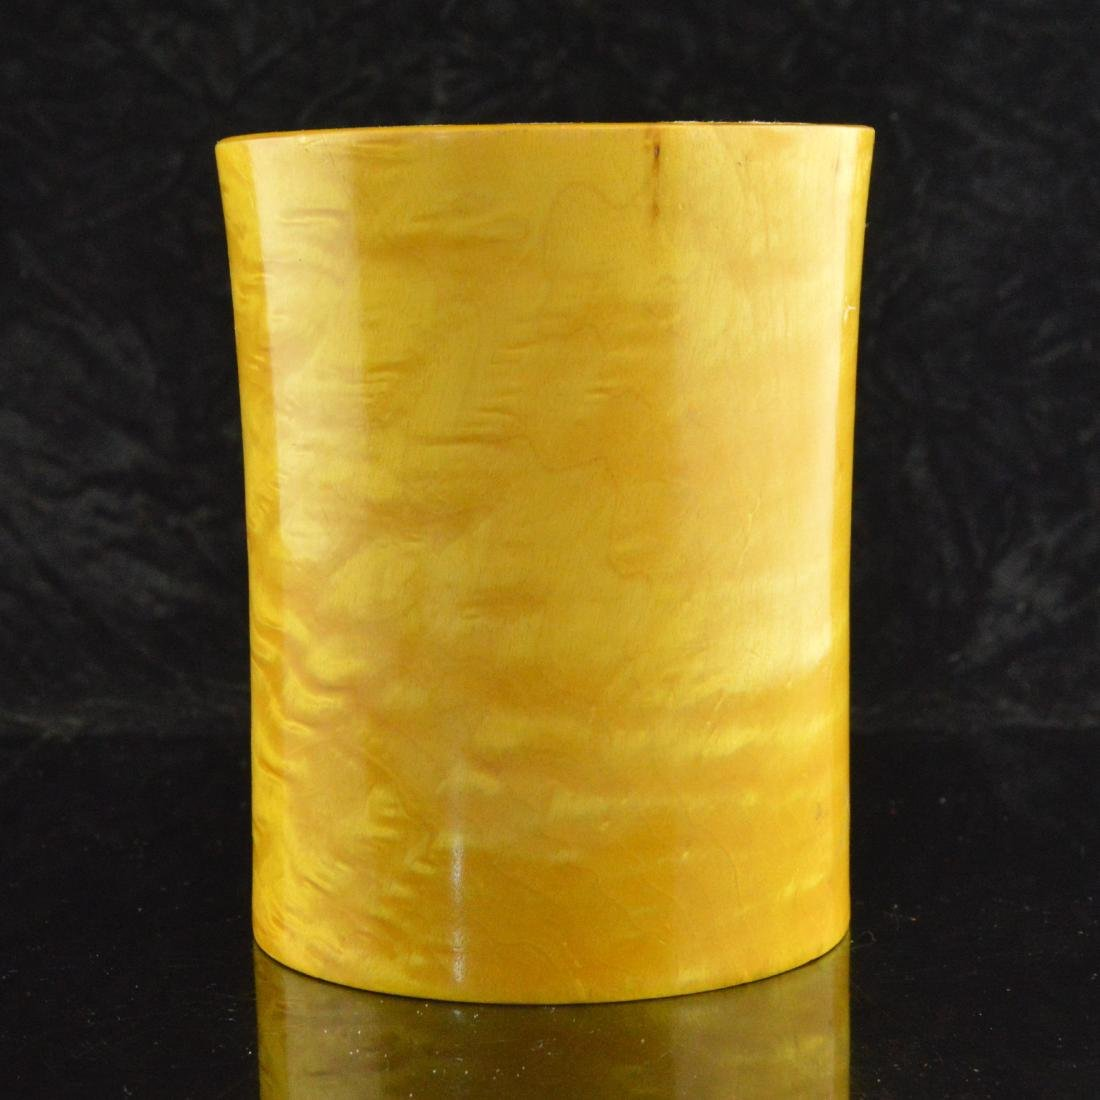 Penholder & Cloisonne Vase Pair - 3